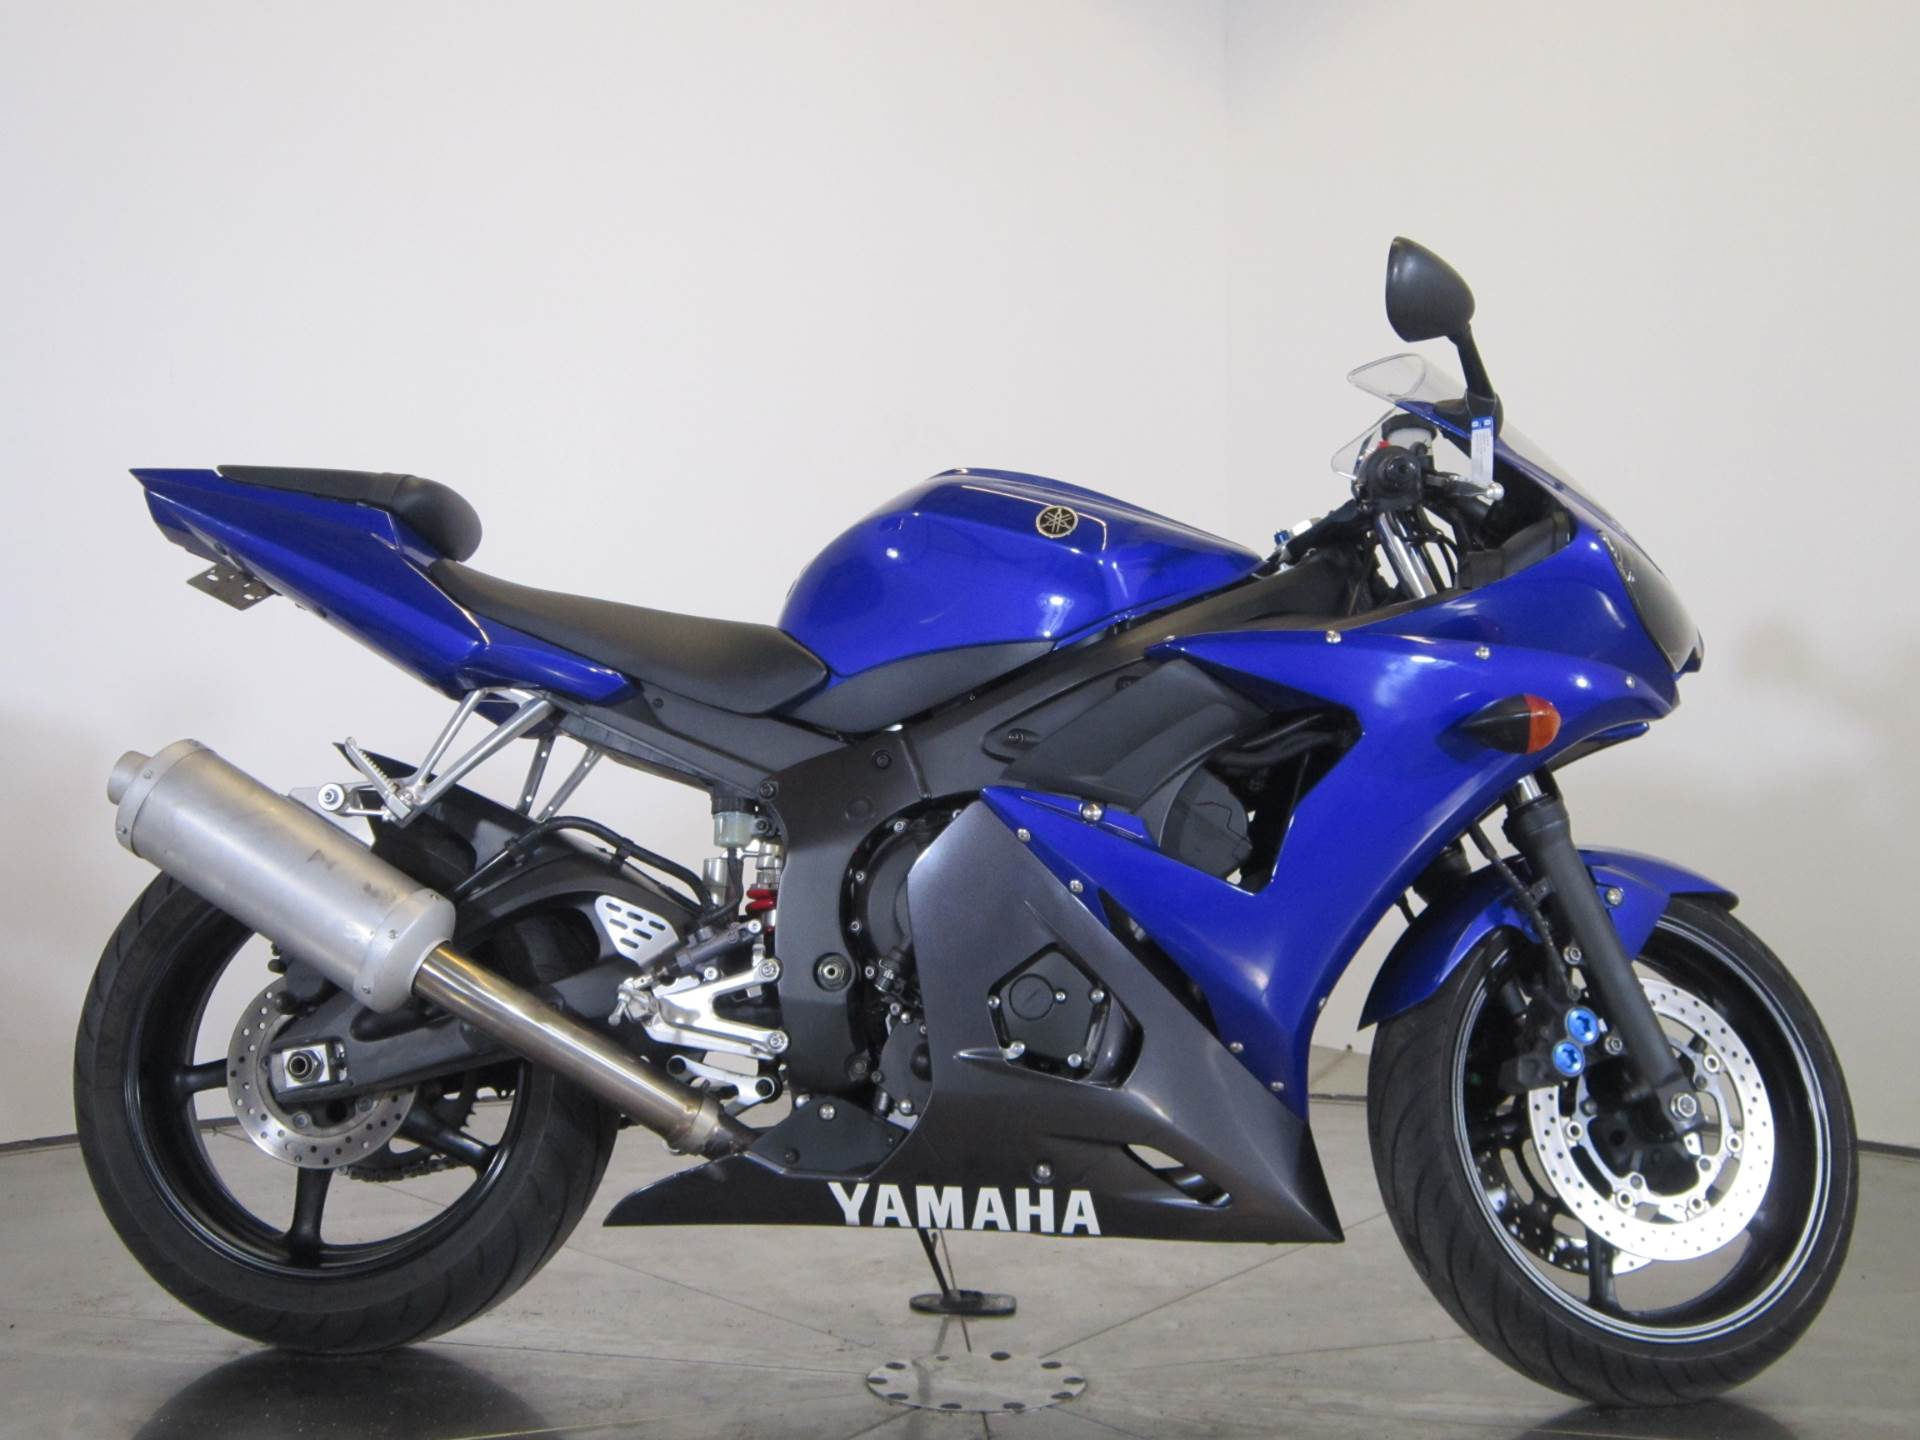 2007 Yamaha YZF-R6 1